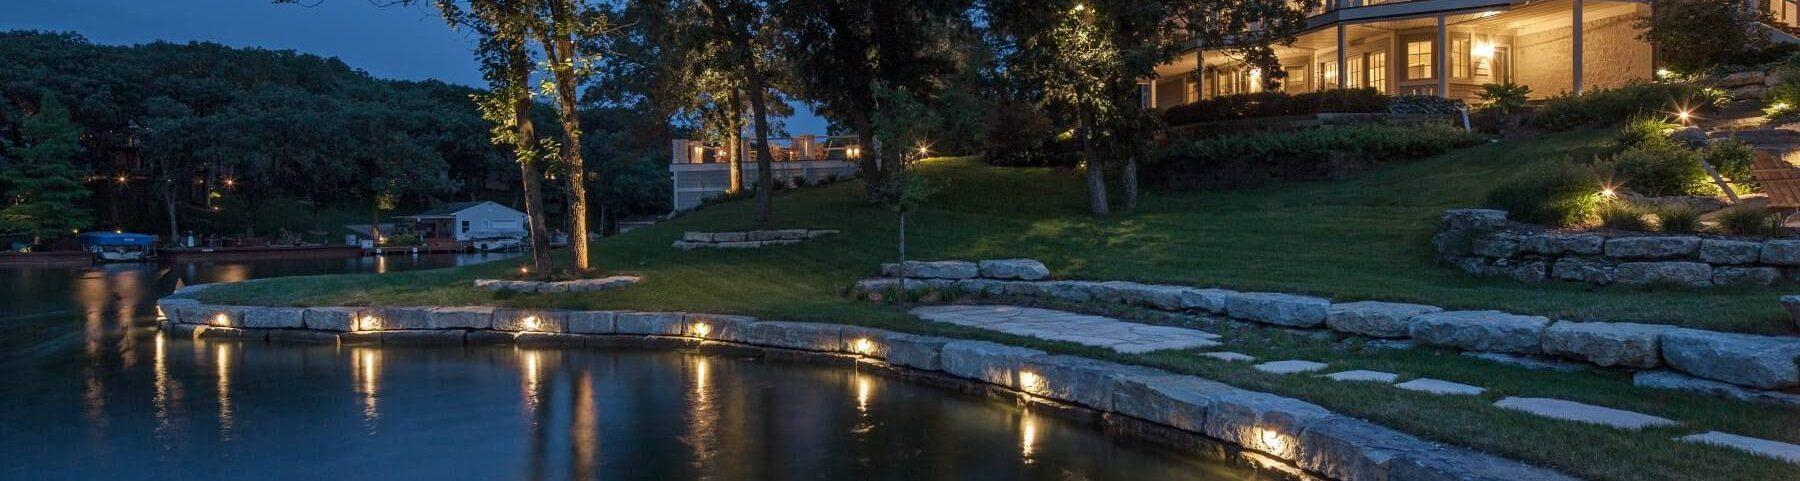 Lake House Outdoor Lighting